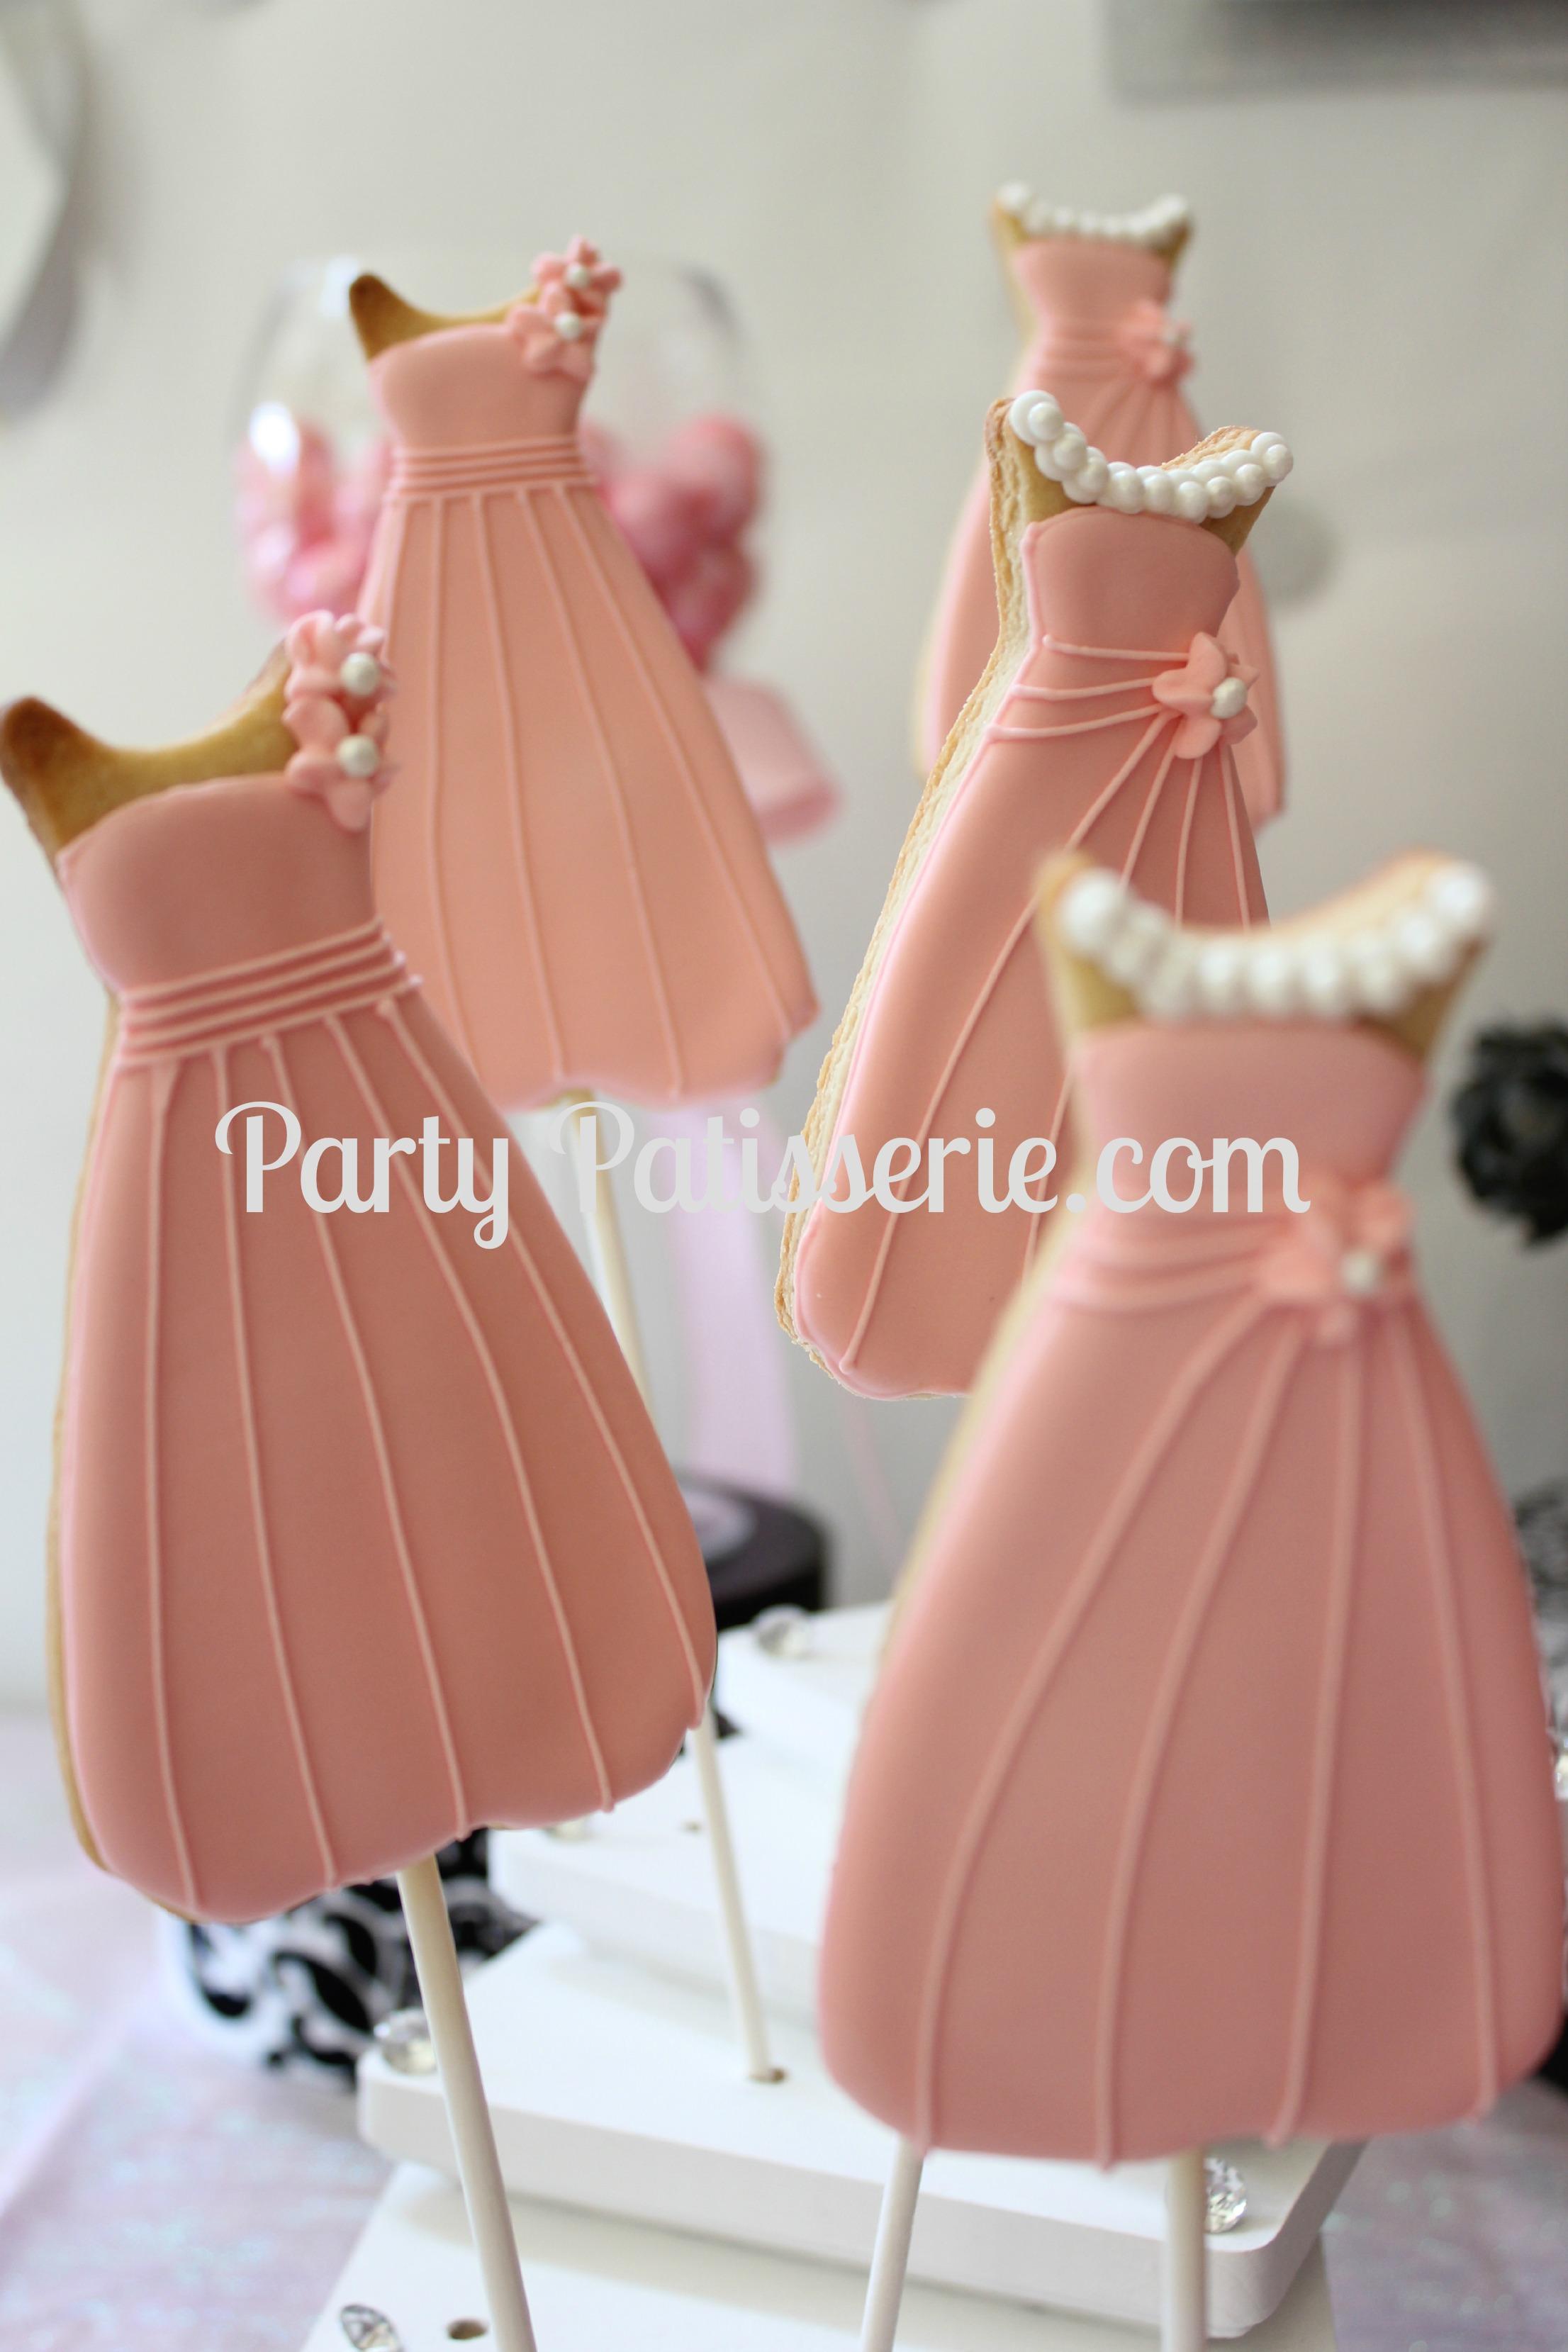 Prom Dresses watermark